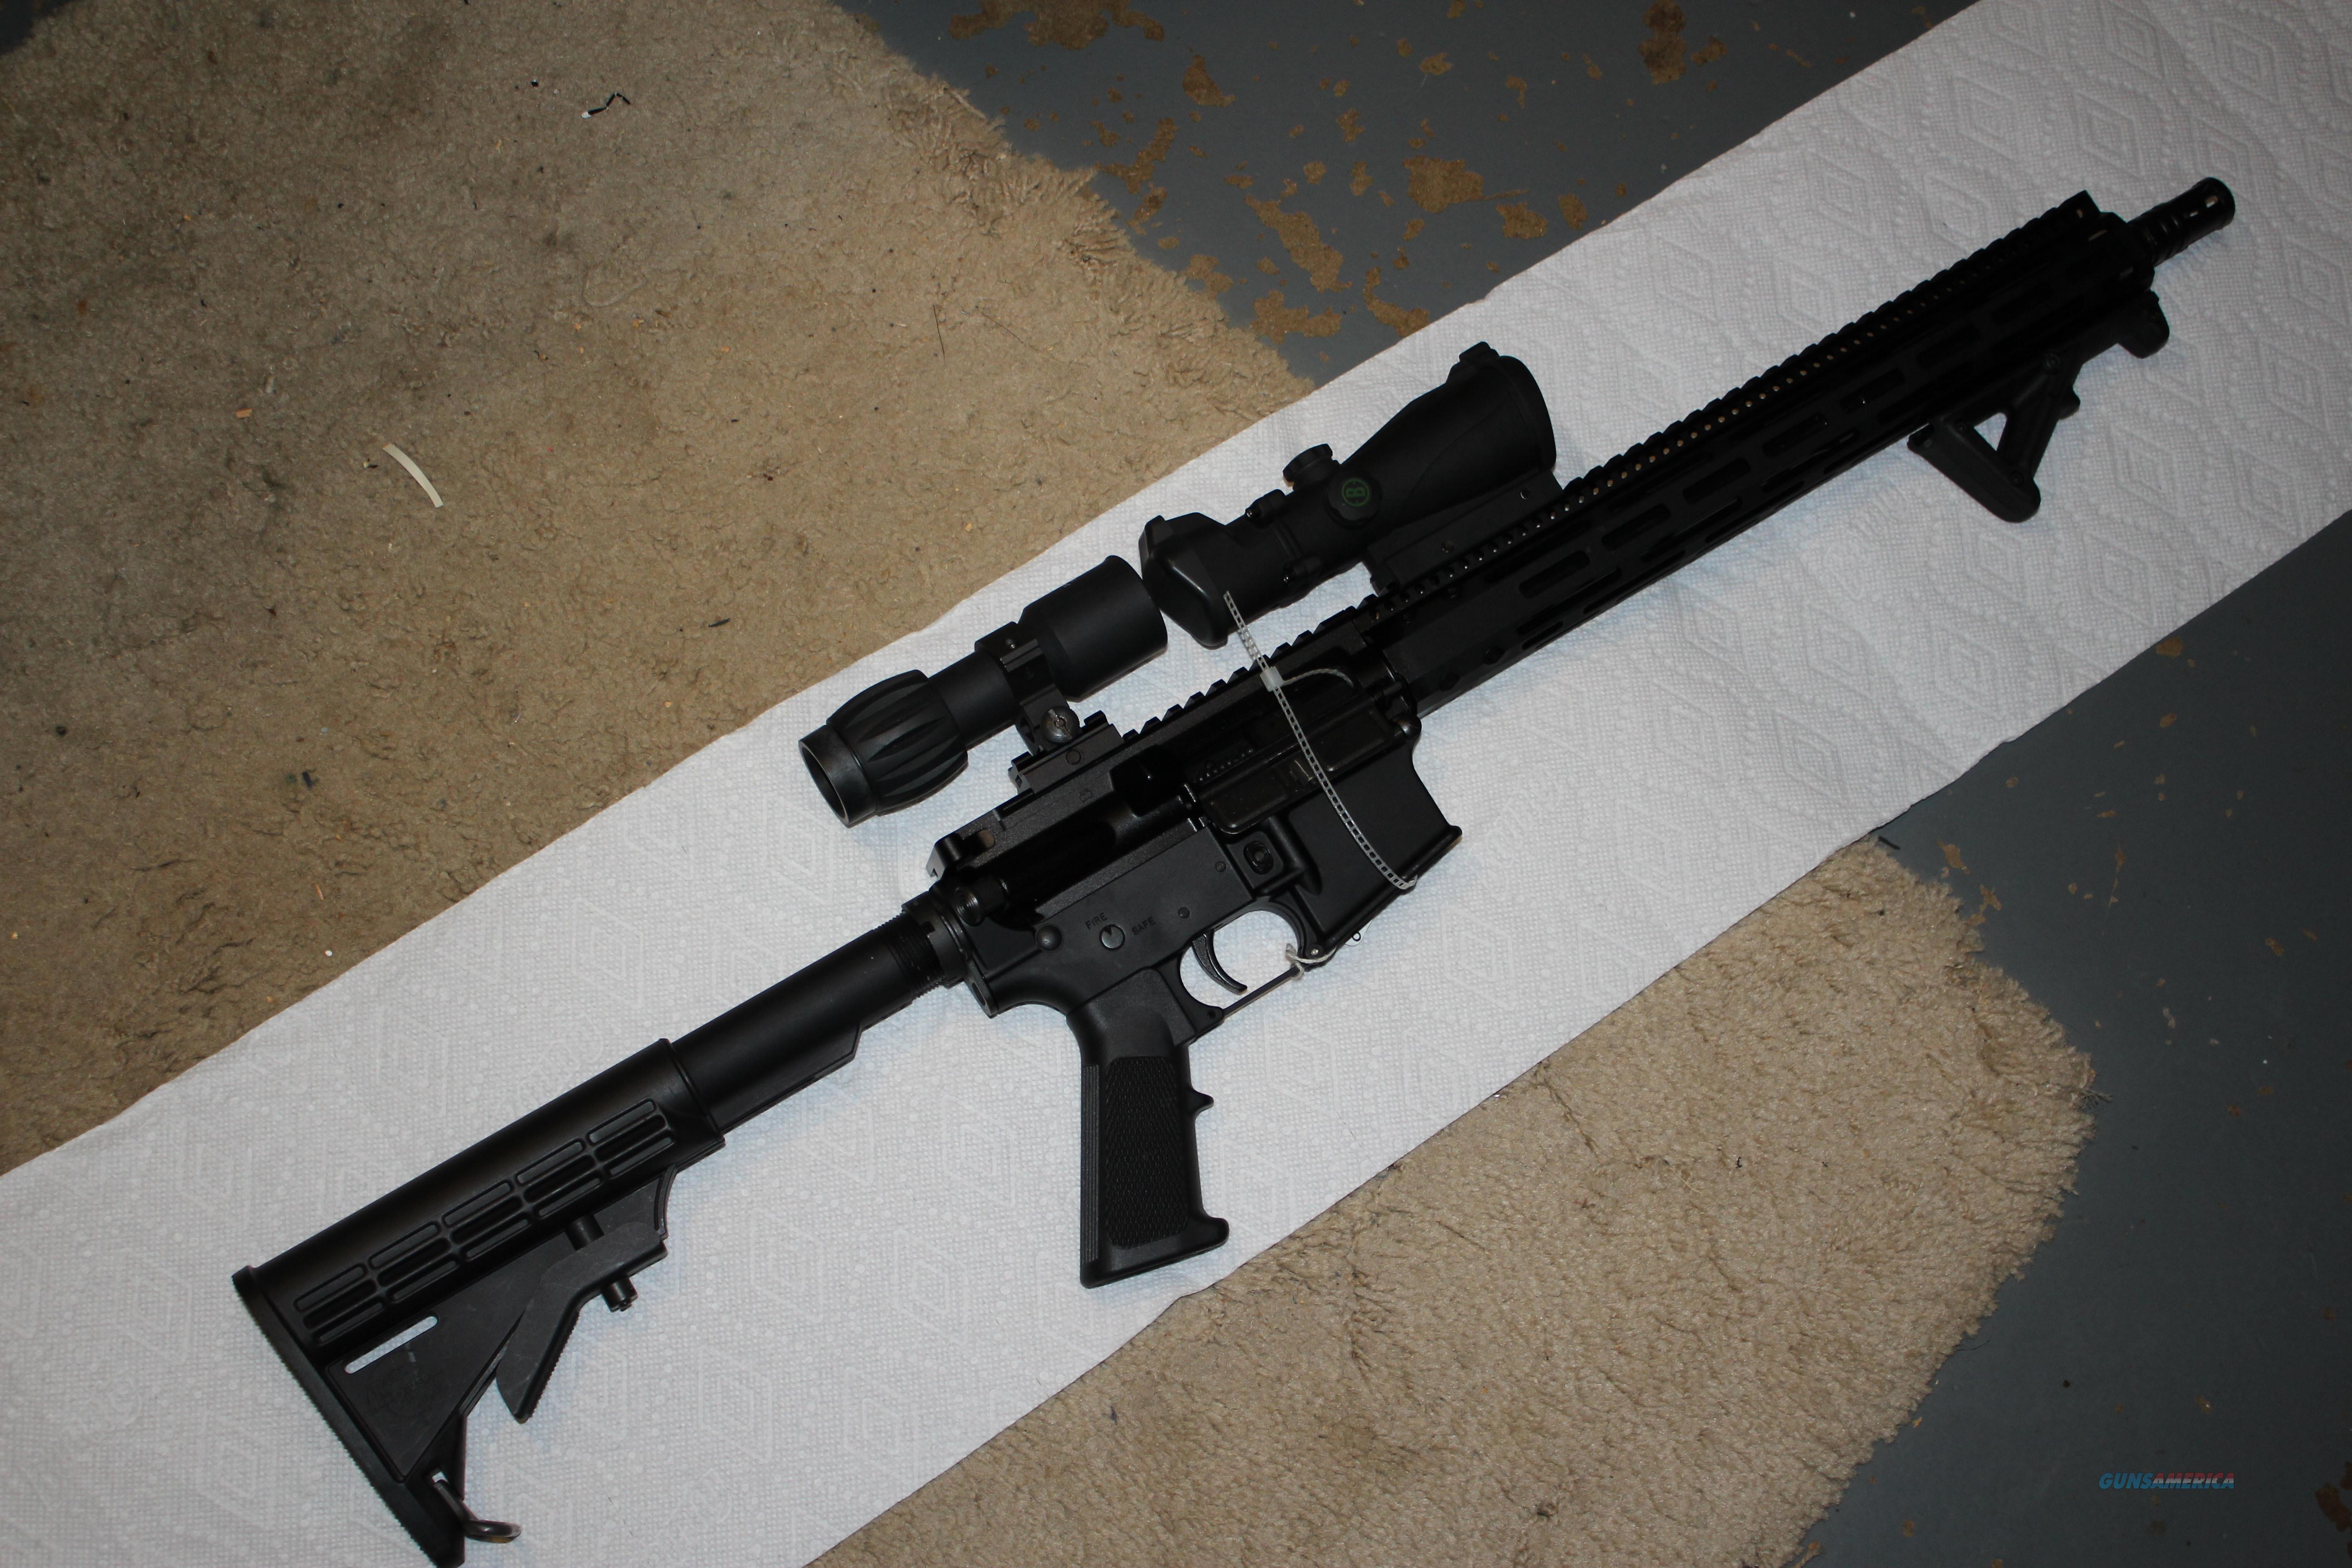 ROCK RIVER ARMS AR-15  Guns > Rifles > AR-15 Rifles - Small Manufacturers > Complete Rifle